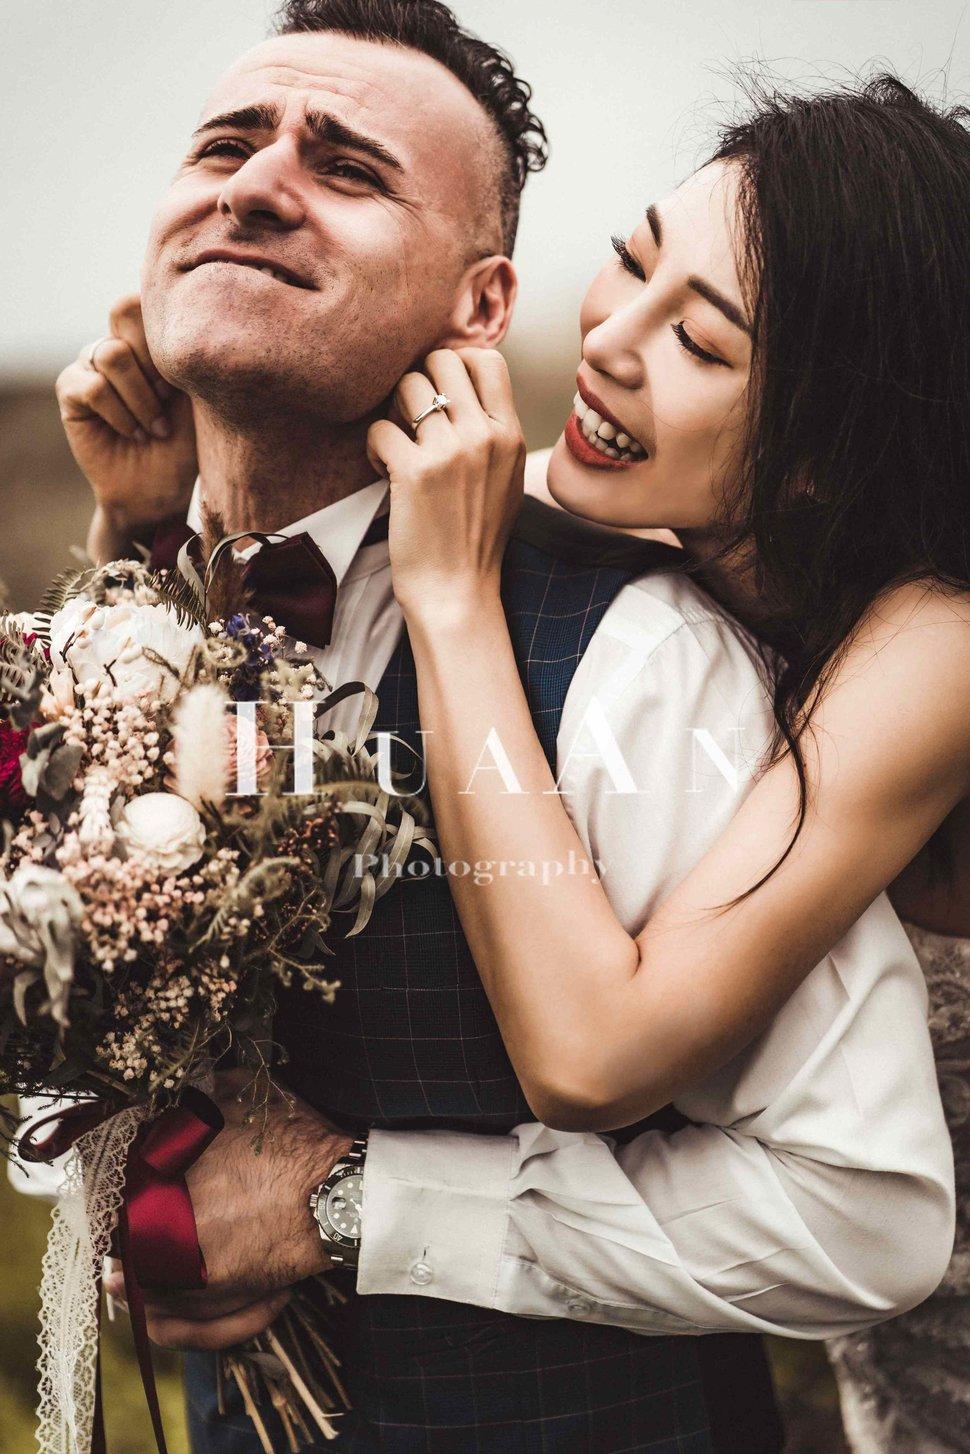 HUA08812 - Huaan Photography《結婚吧》